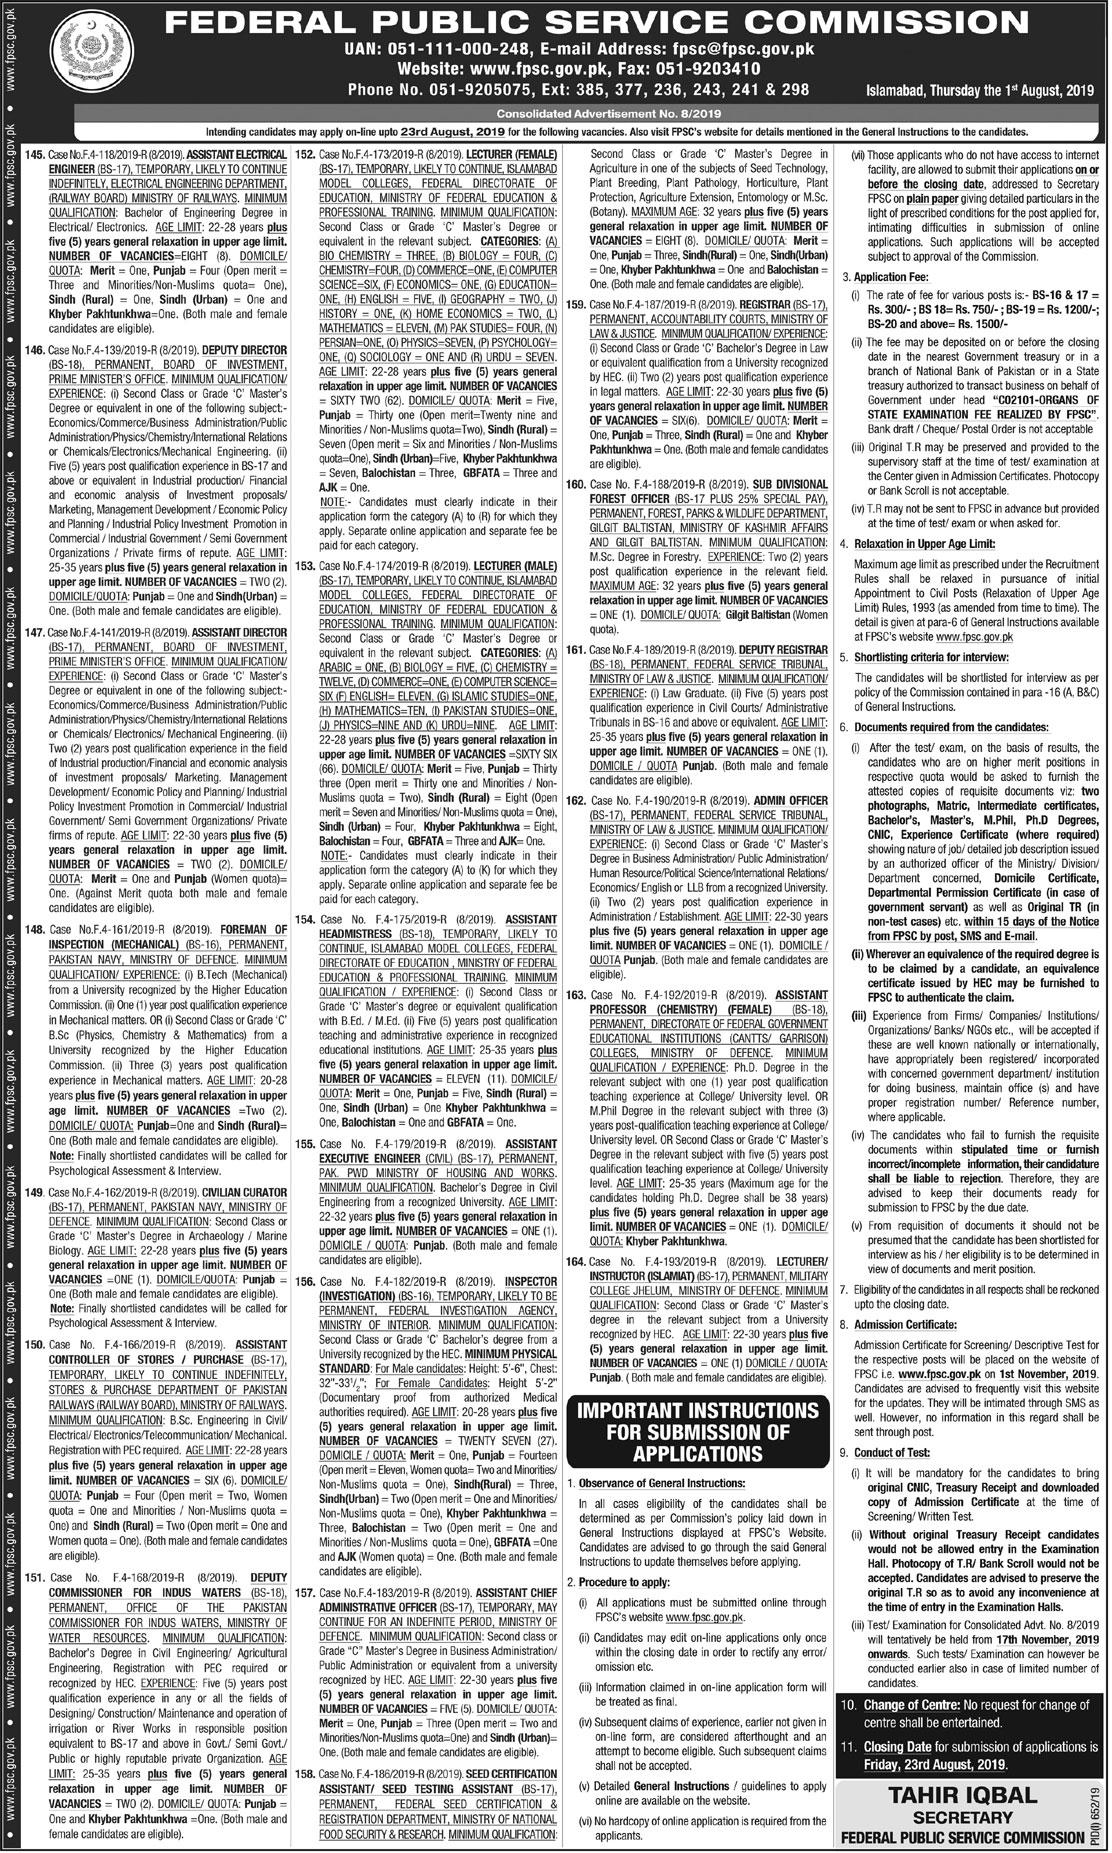 Ffpsc Calendrier 2019.Fia Jobs 2019 Pakistan Federal Investigation Agency